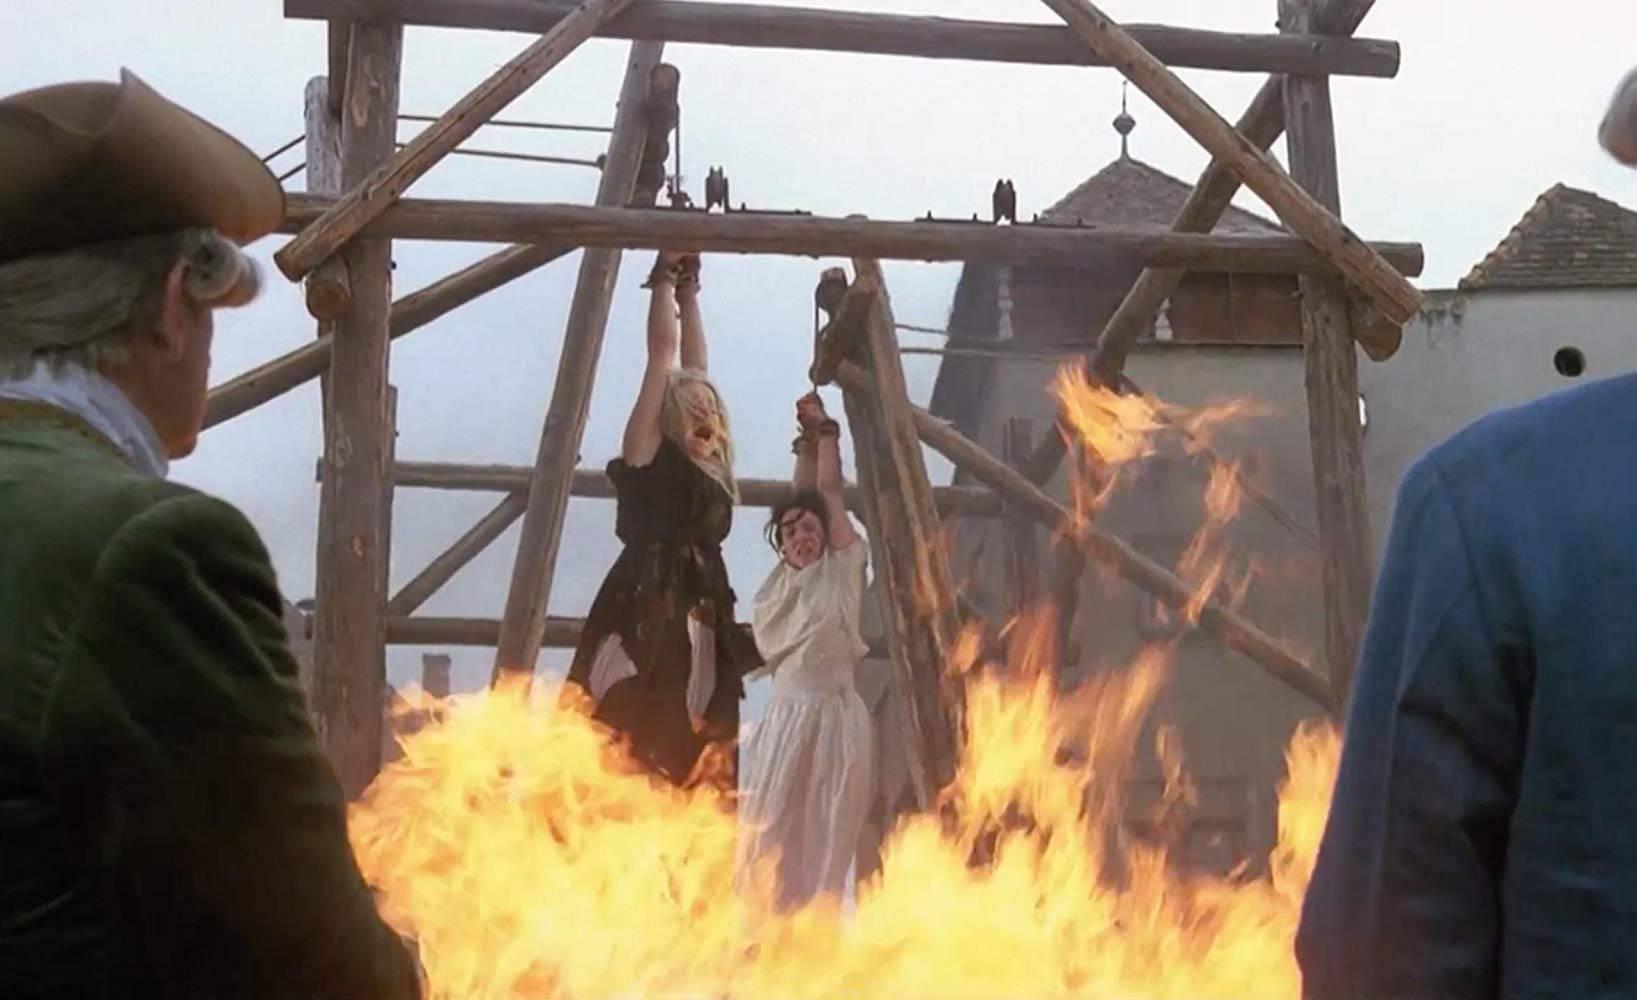 Egzekucije, crne mise, ubojstva francuske elite i sotonizam...